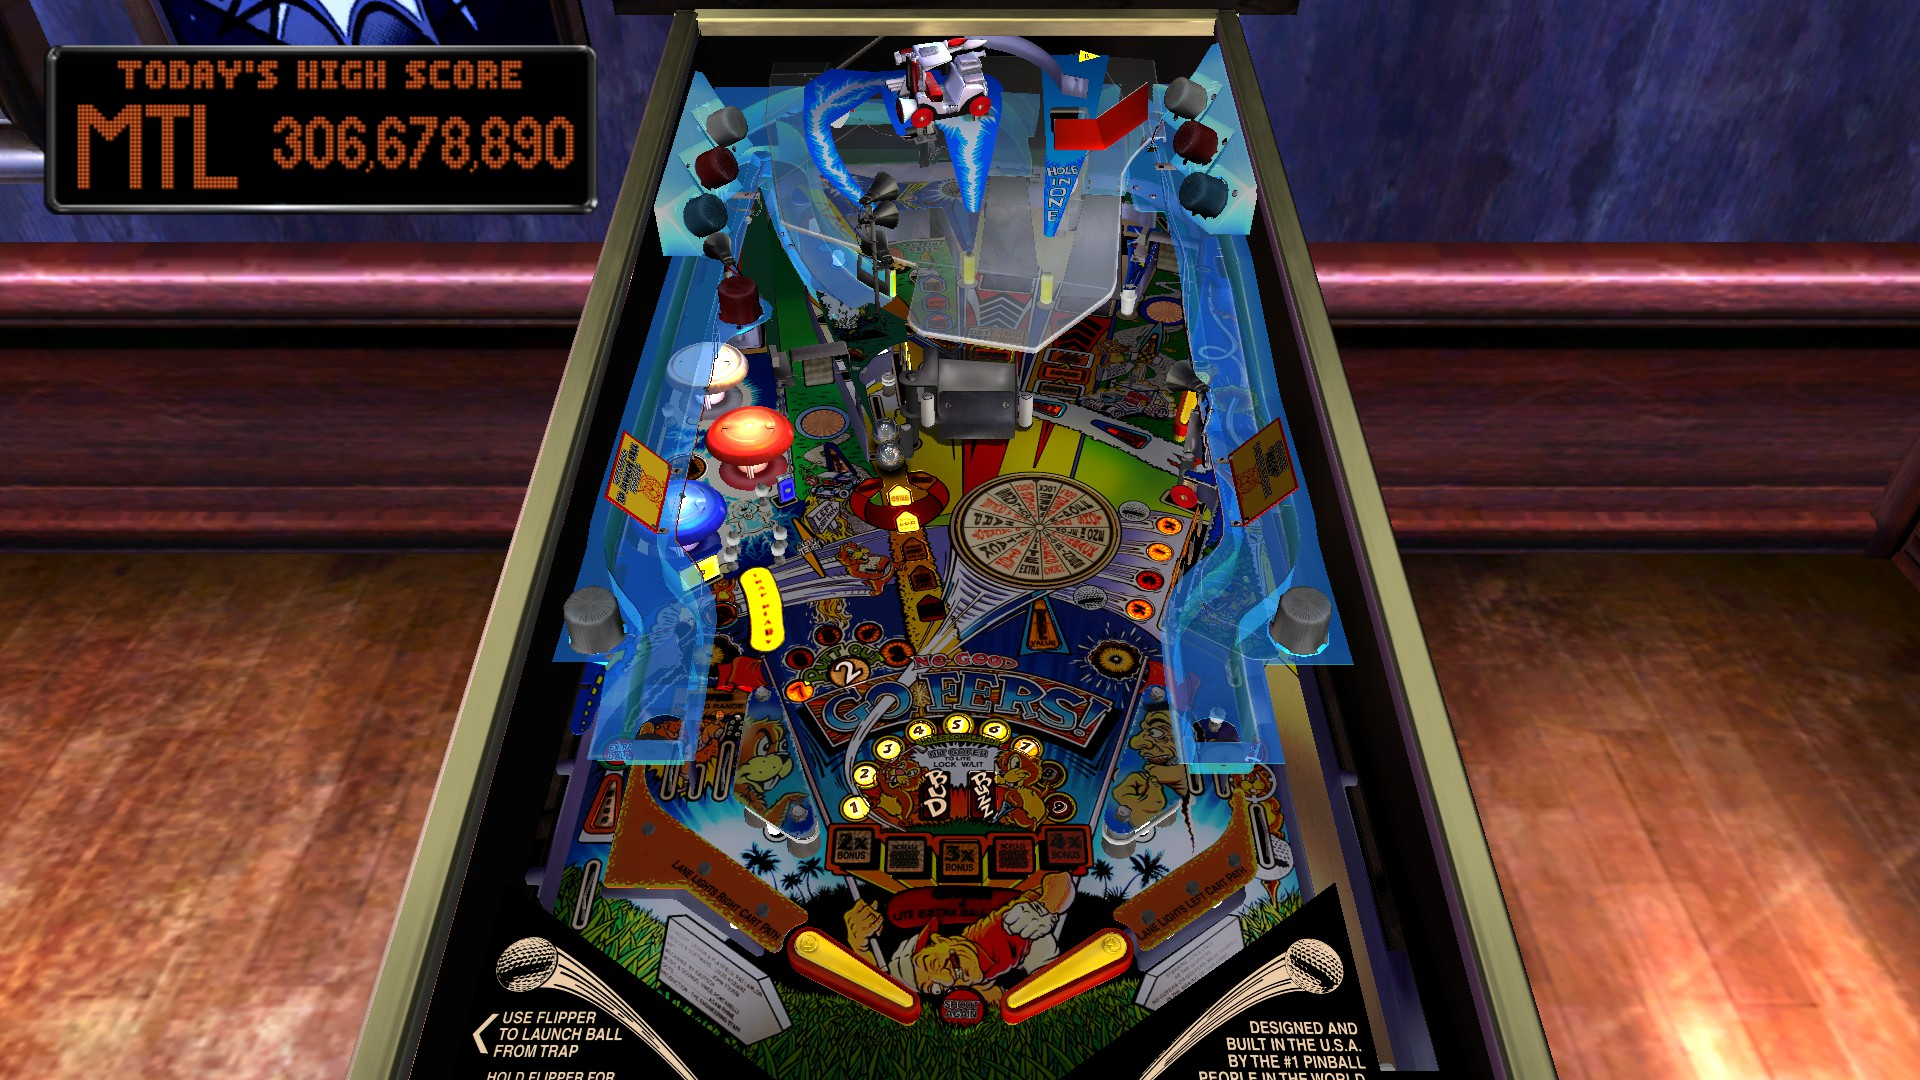 Mantalow: Pinball Arcade: No Good Goofers (PC) 306,678,890 points on 2016-05-13 08:11:32